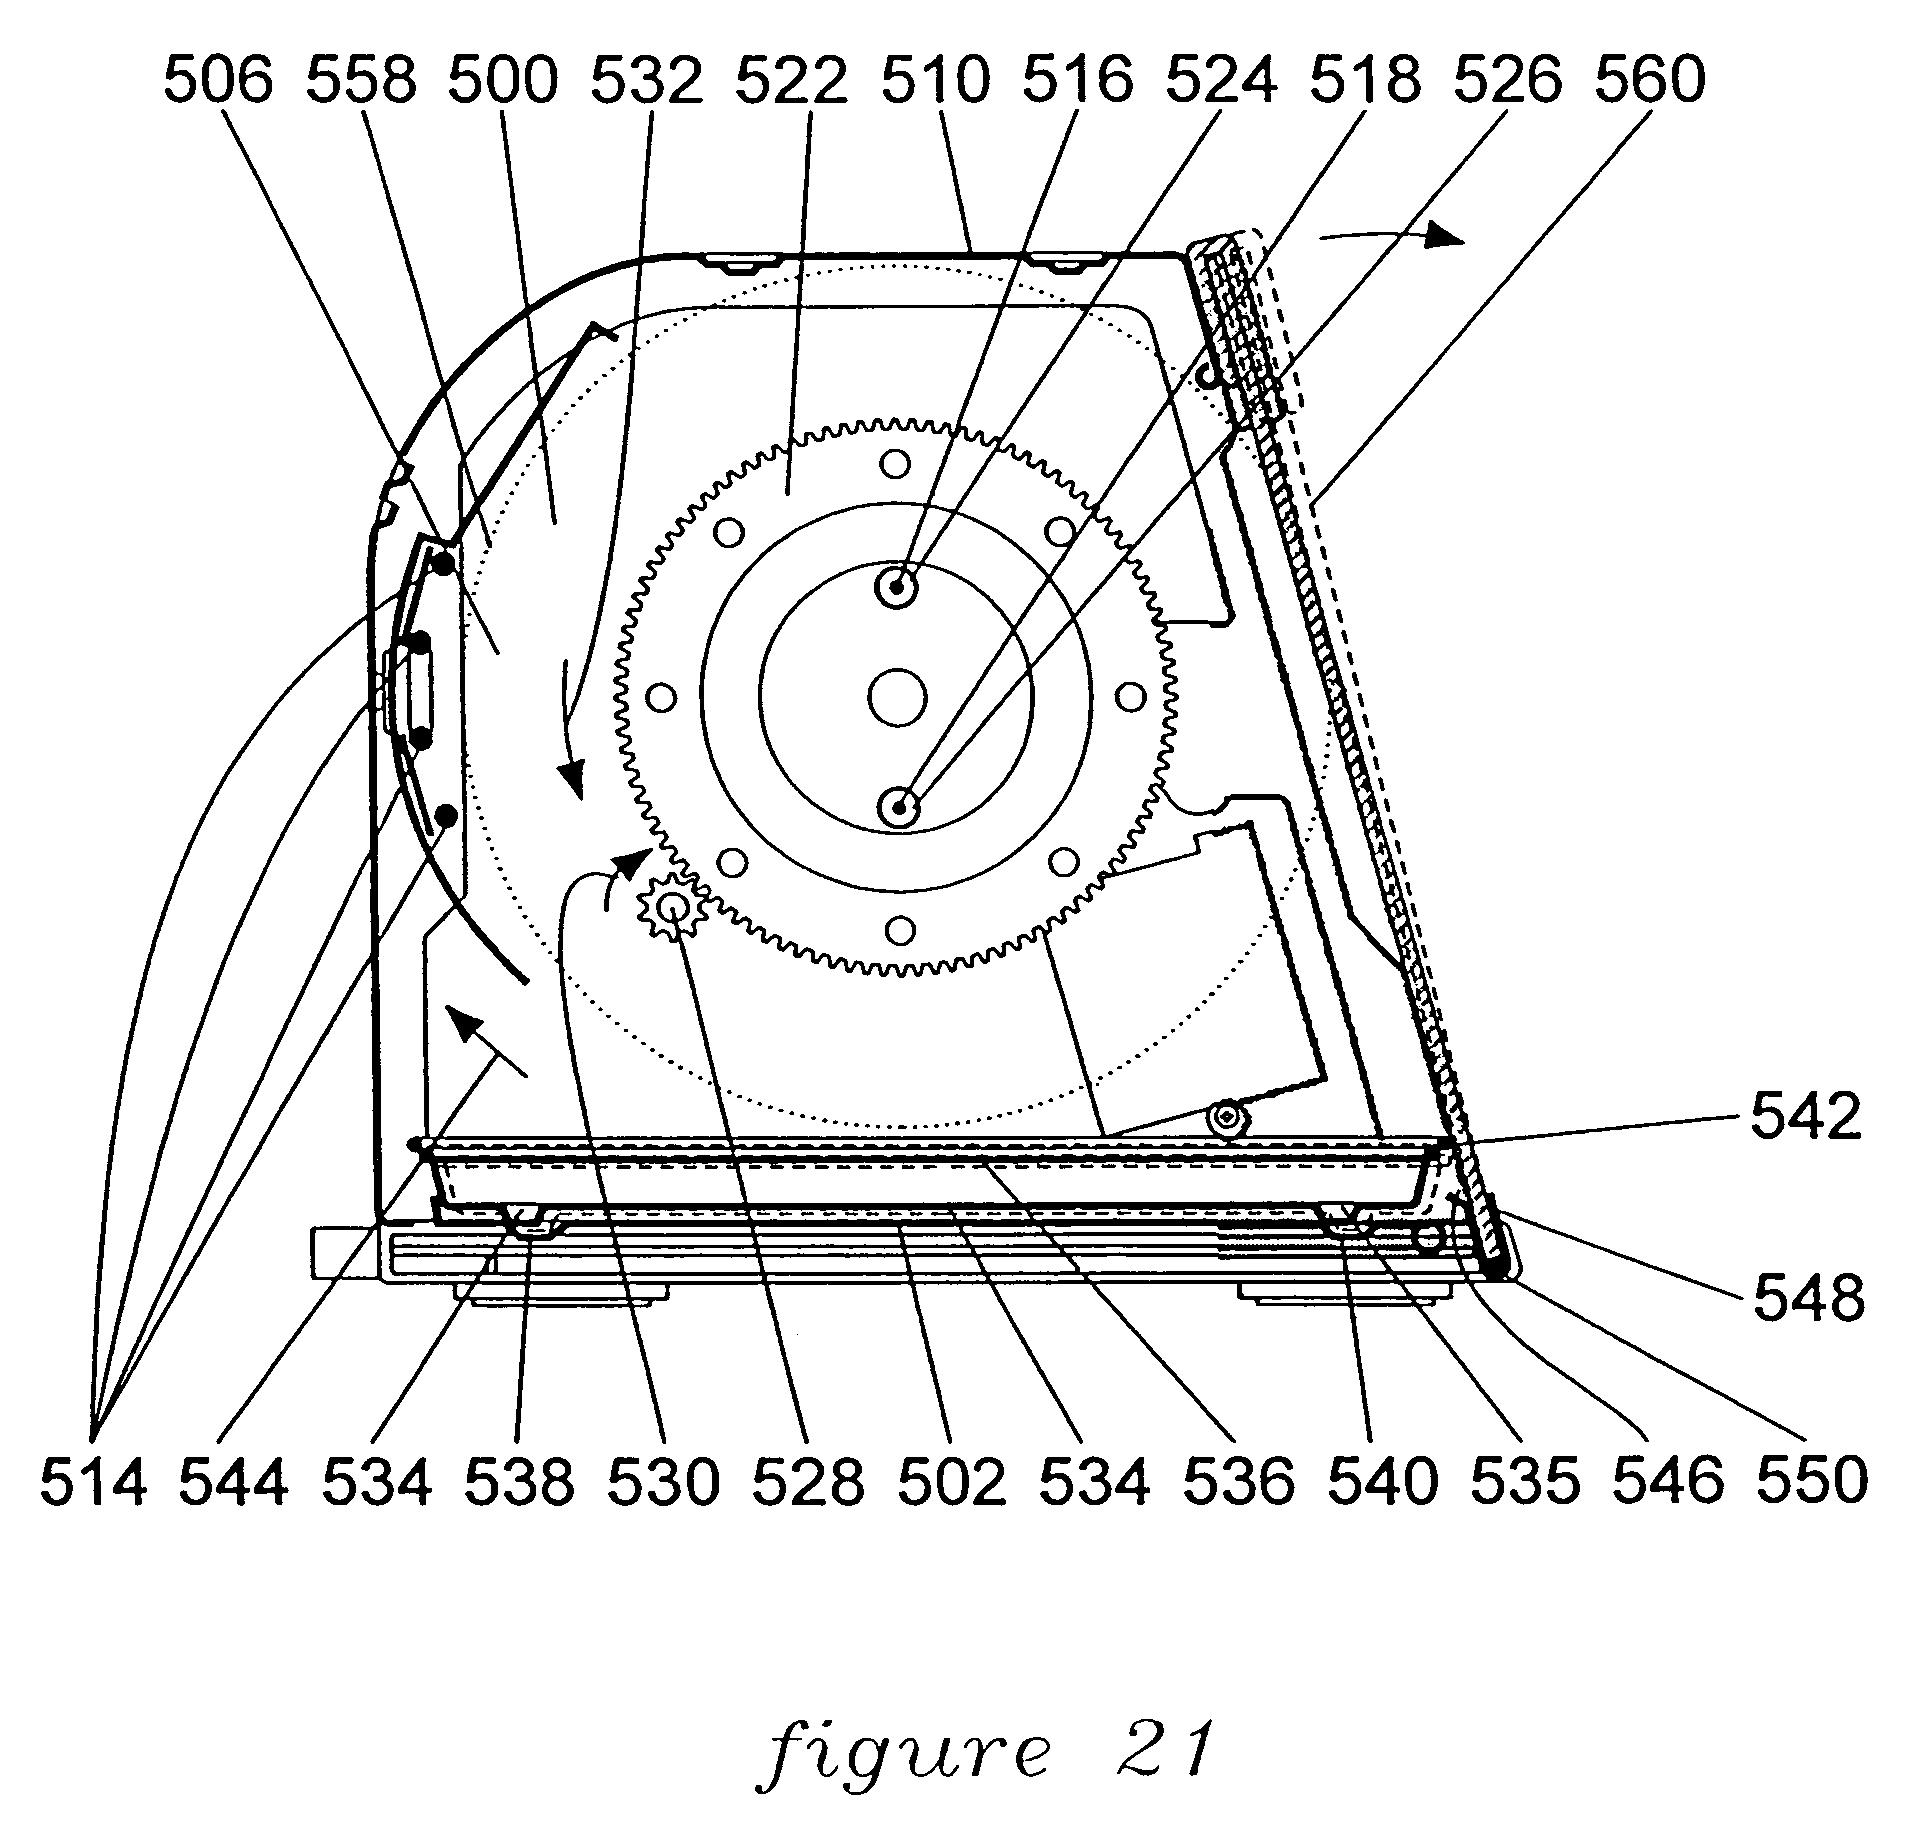 Patent US 7,424,849 B2